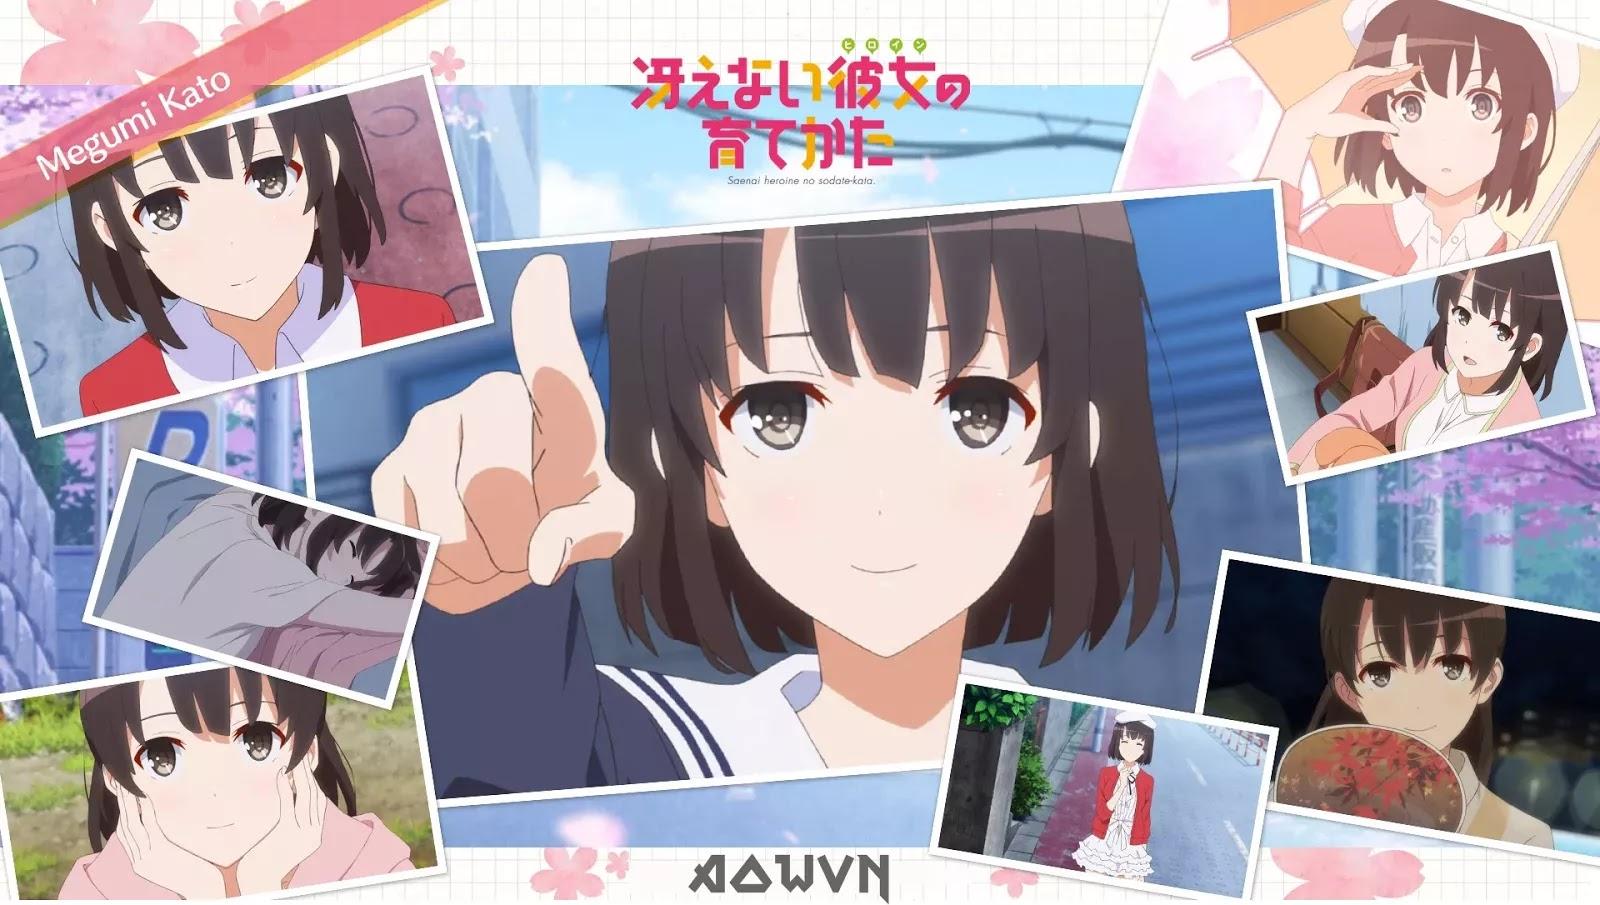 AowVN.org m%2B%25282%2529 - [ Anime 3gp Mp4 ] Saenai Heroine no Sodatekata Season 1 + 2 BD   Vietsub